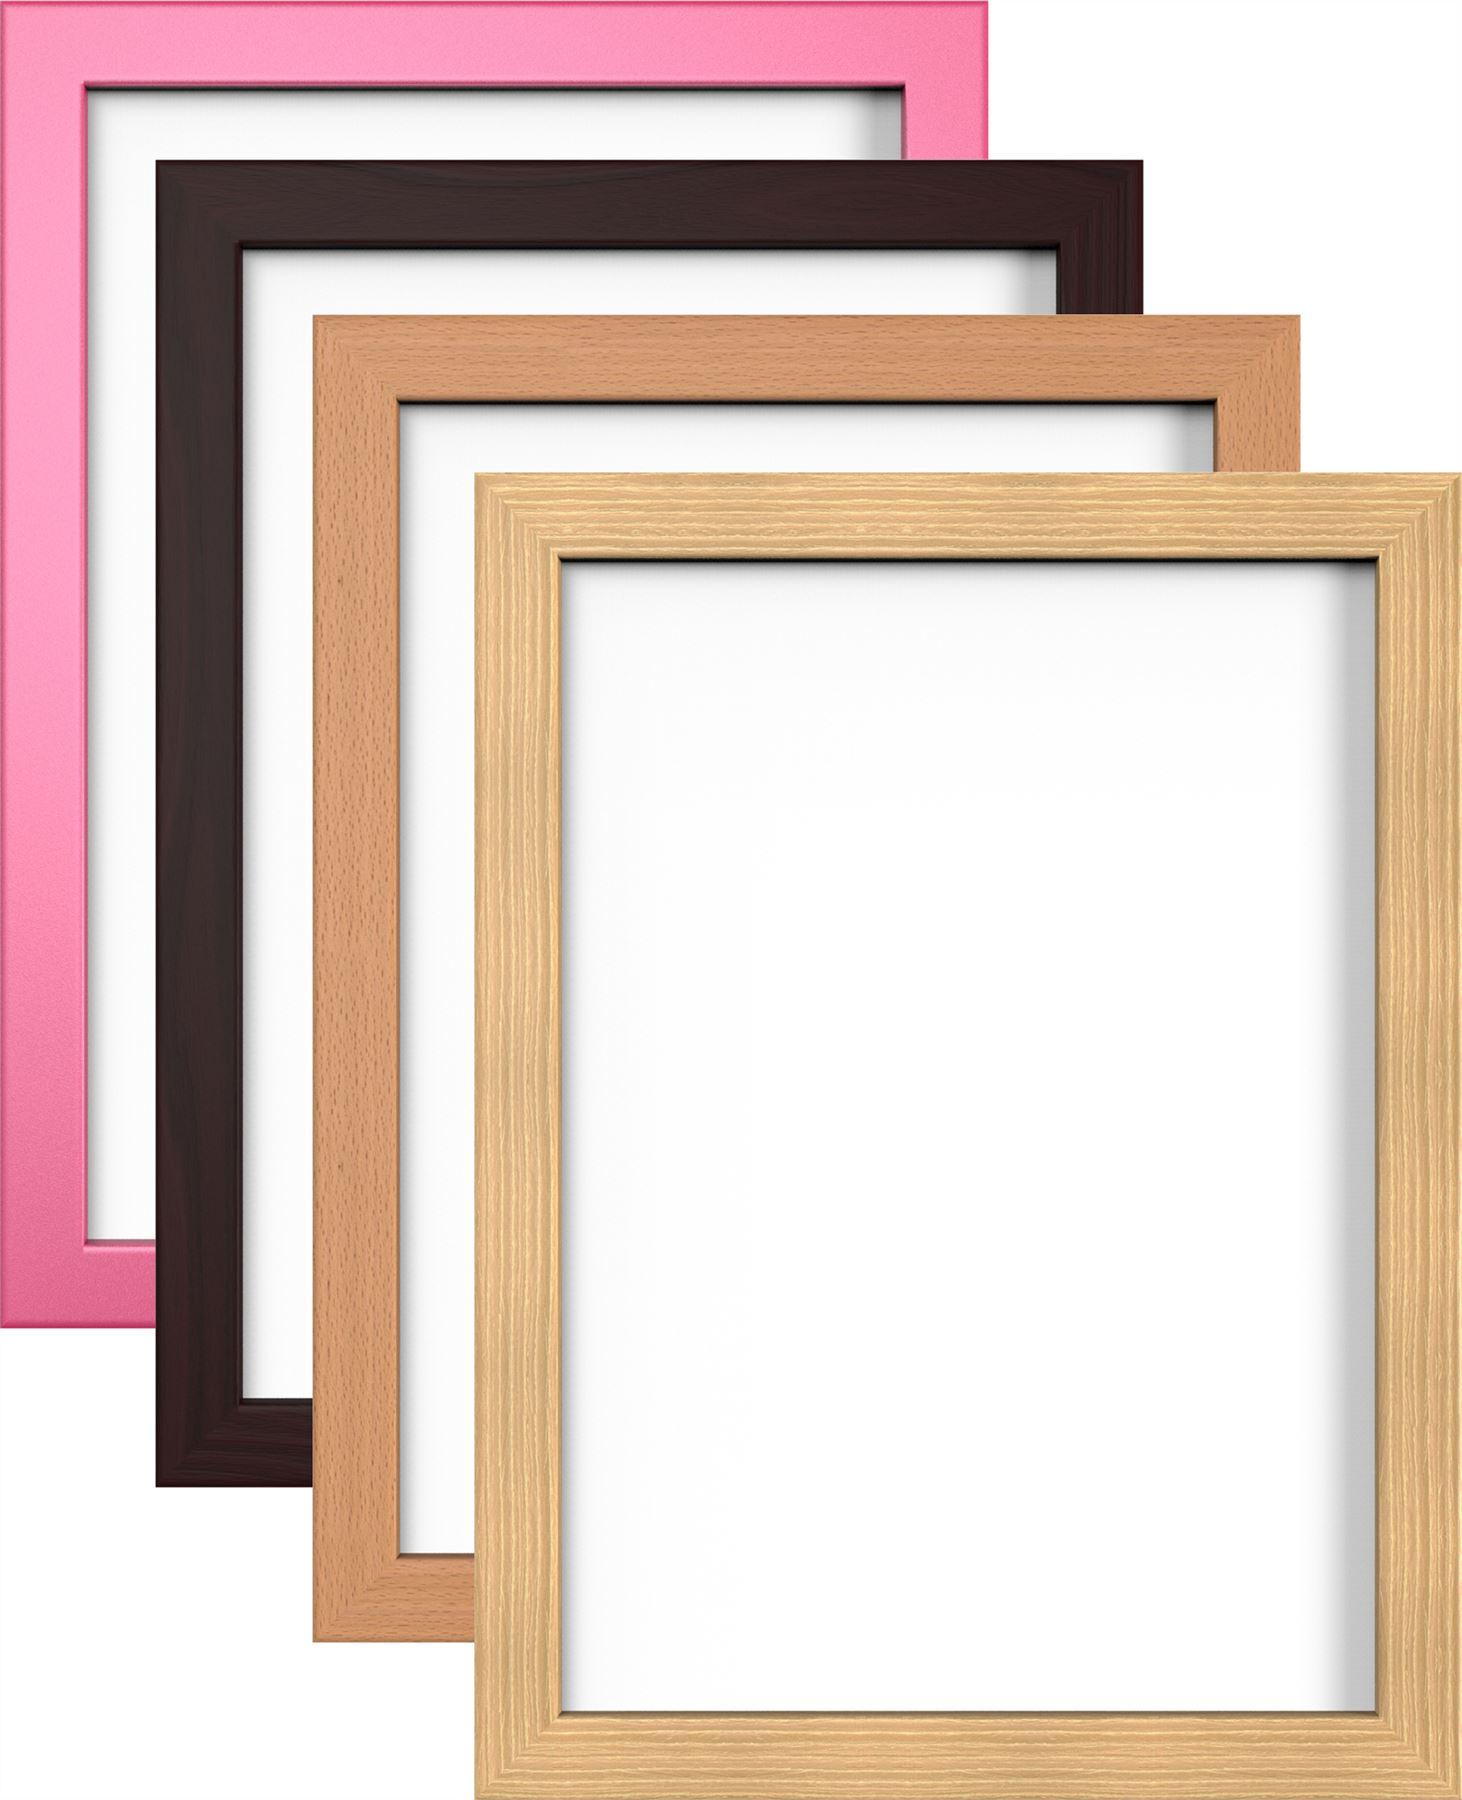 photo frame picture frame poster frames large small square. Black Bedroom Furniture Sets. Home Design Ideas